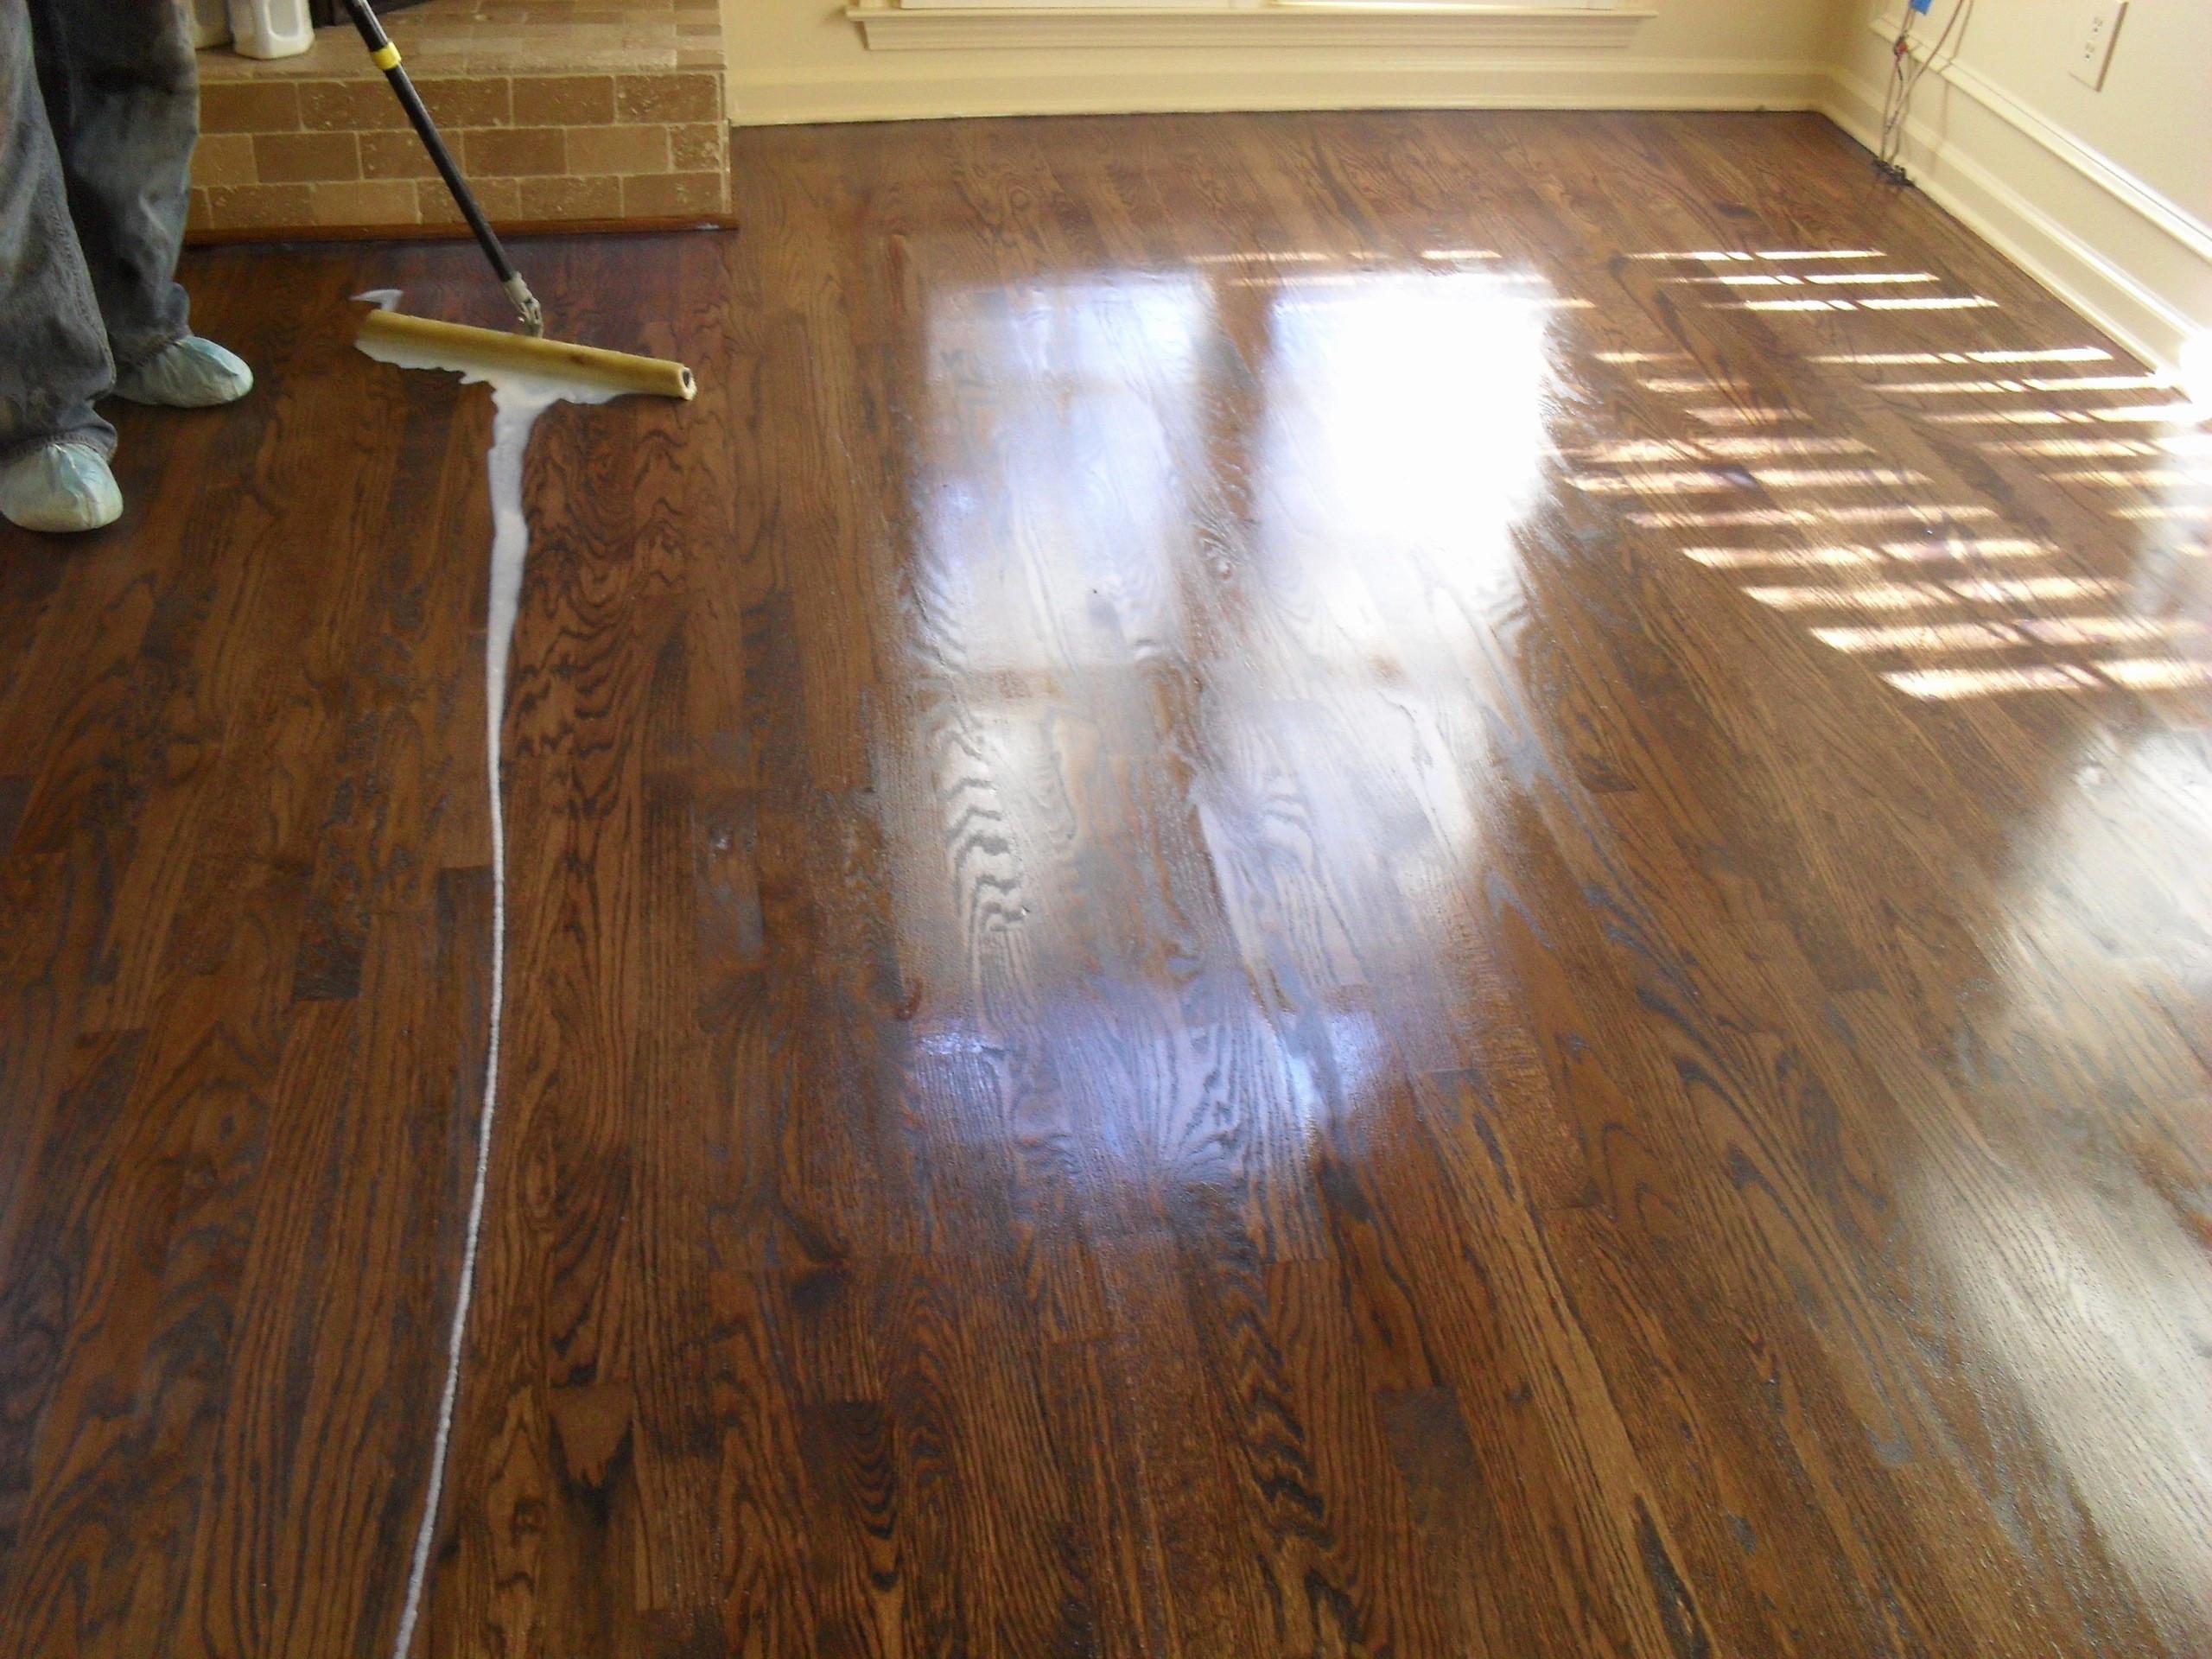 Refinishing Old Hardwood Floors Cost Of Cost to Refinish Hardwood Floors Floor Plan Ideas for 20 Photos Of the Cost to Refinish Hardwood Floors